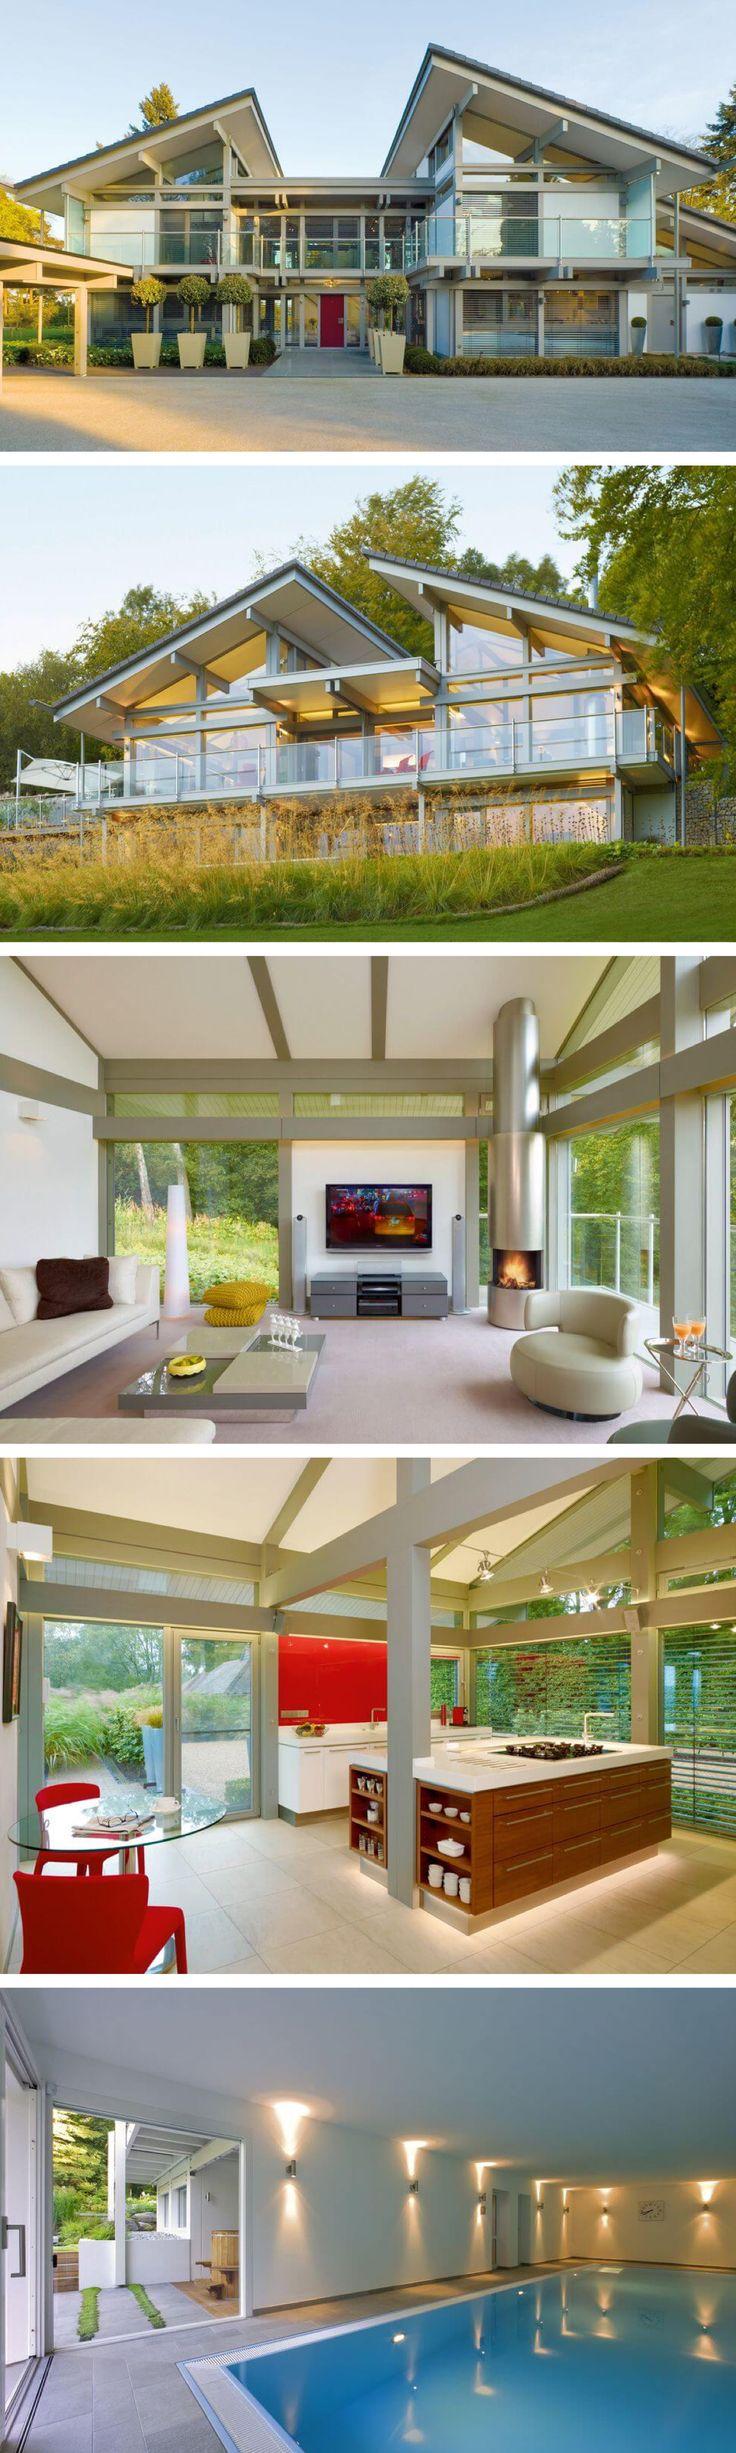 136 best Luxus images on Pinterest | Arquitetura, Bedroom ideas and ...